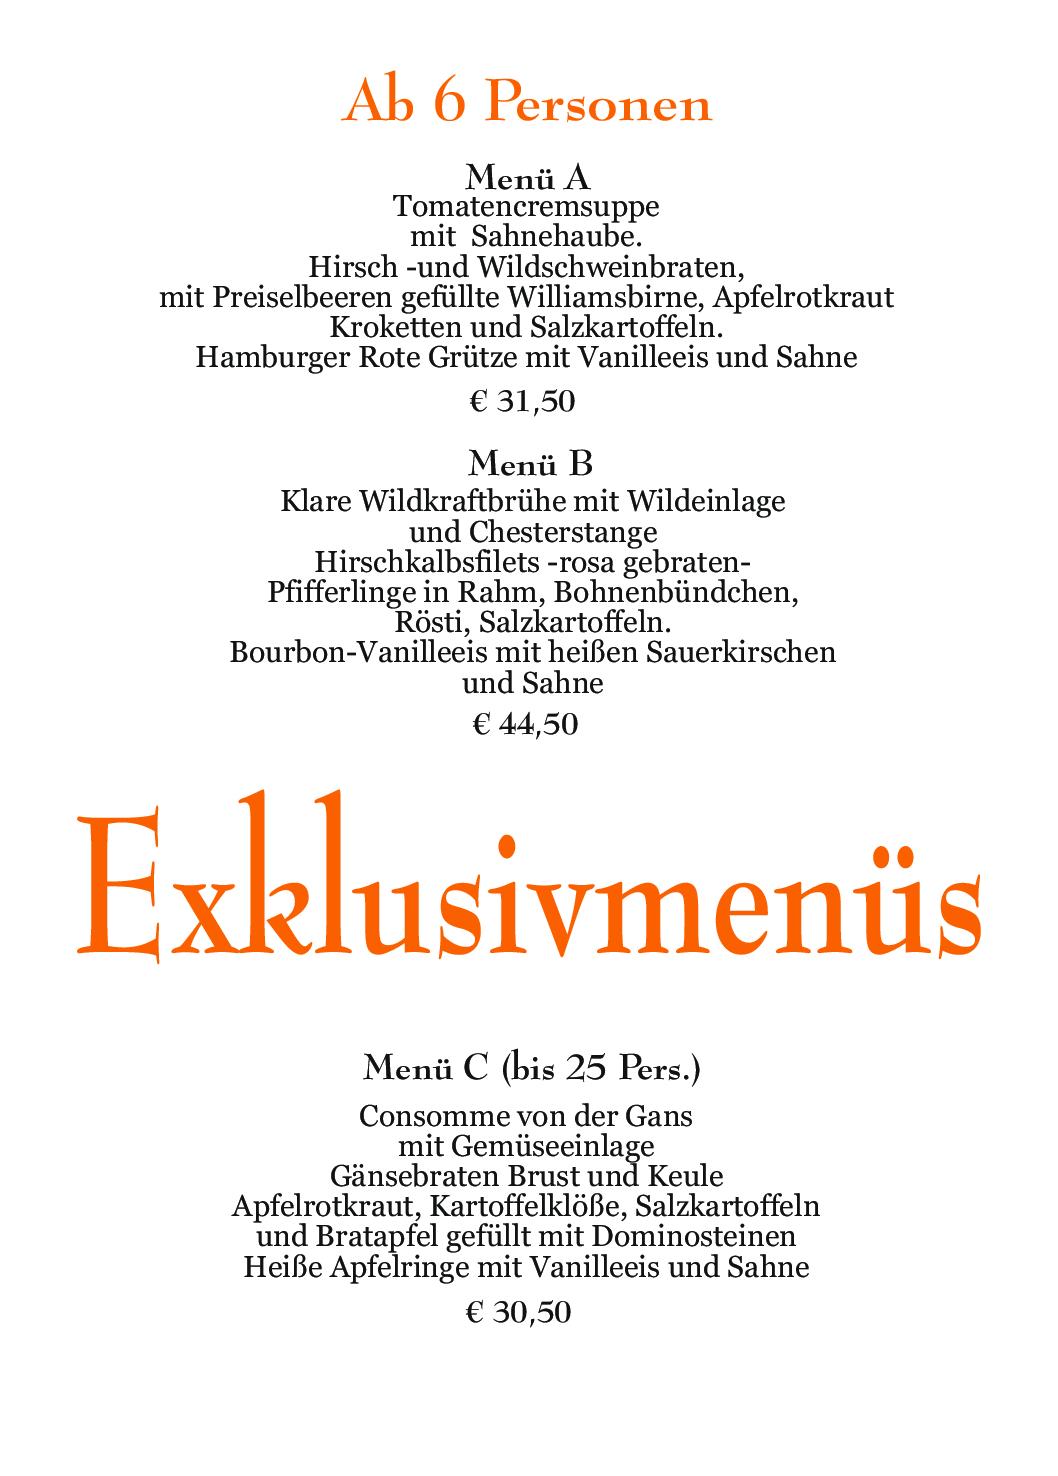 Waldcafe Corell, Speisekarte, Exklusivmenüs